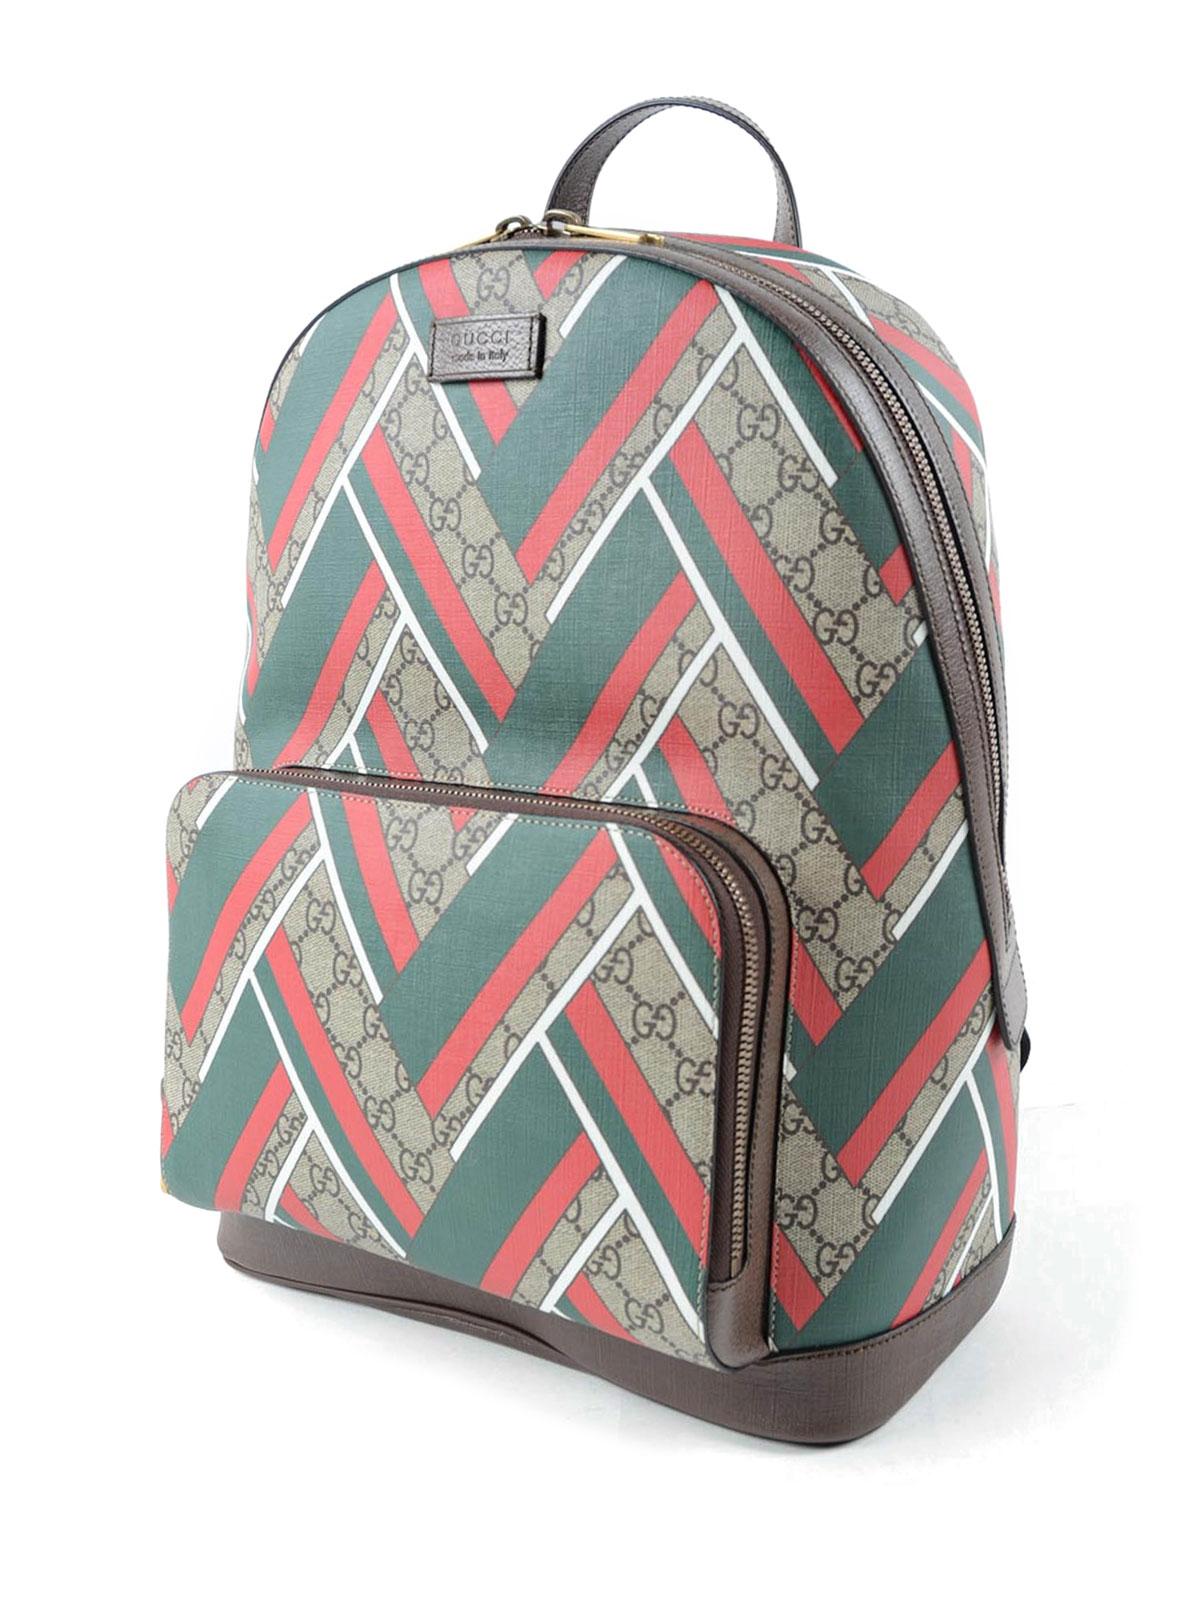 92f4246fa618 Gucci - GG Supreme and Chevron backpack - backpacks - 406370/K1MIT 8559